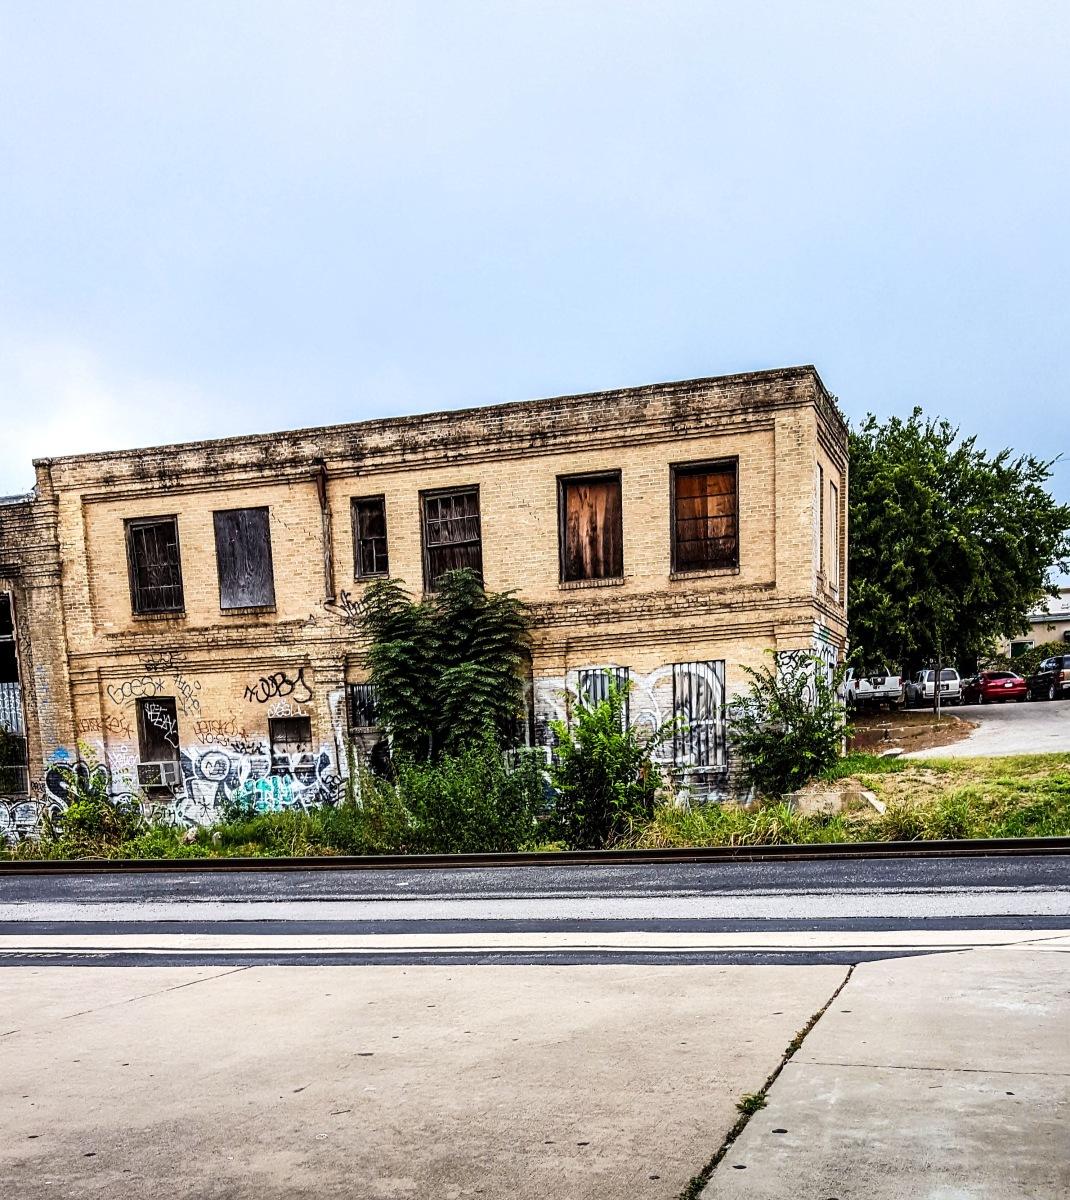 Amtrak station Austin Texas